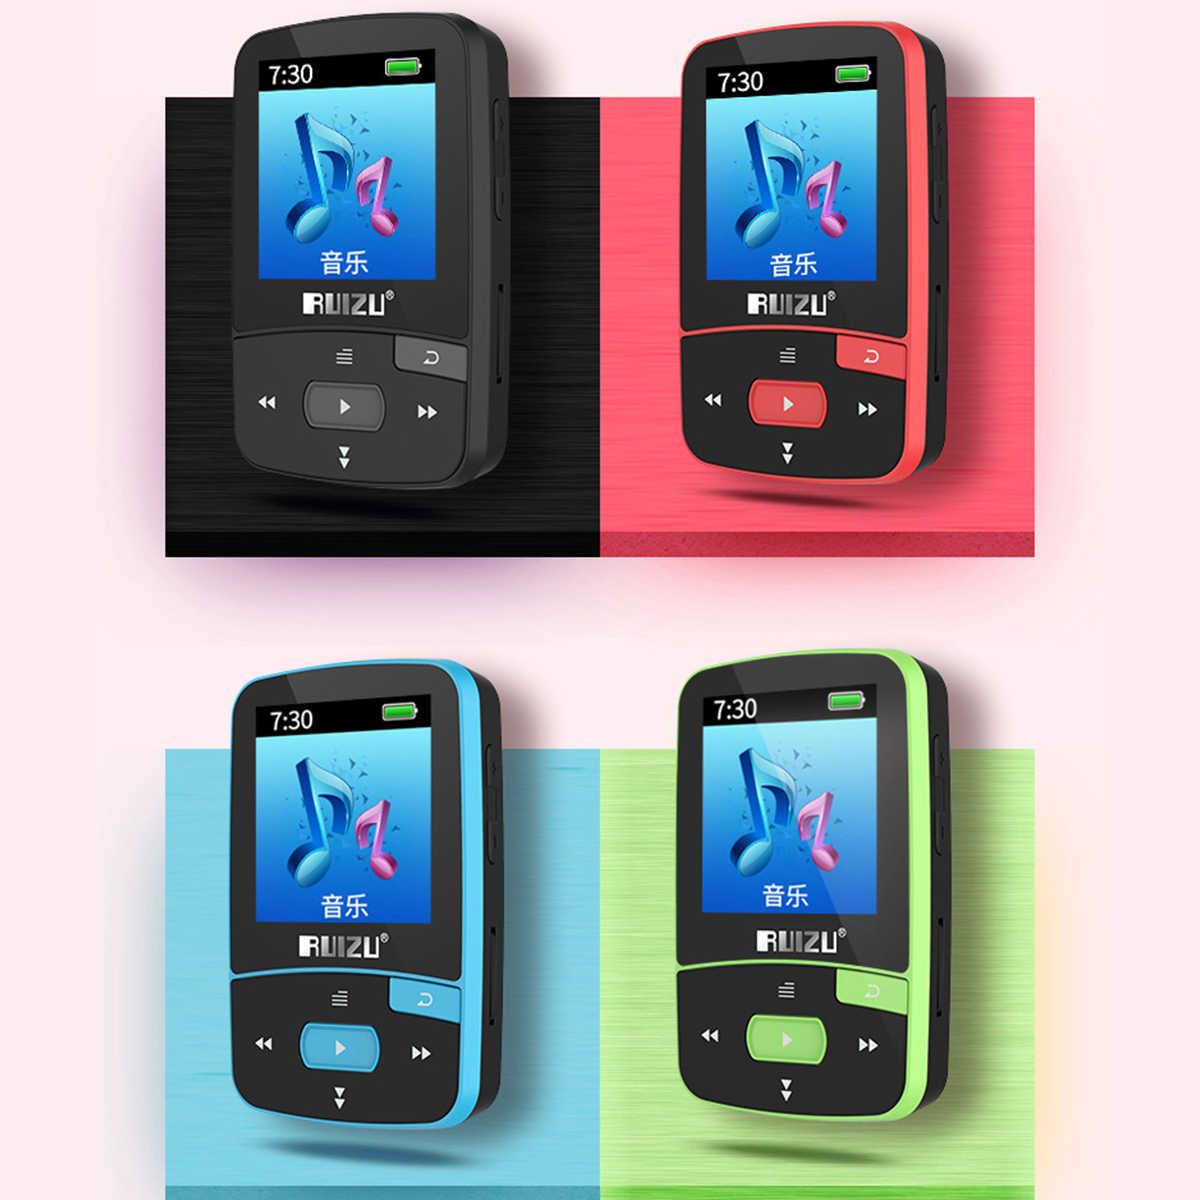 Ruizu X50 Спорт Аудио Мини Bluetooth Mp3 плеер аудио Mp 3 с радио цифровой Hi-Fi Экран Fm Flac Usb 8 Гб без потерь